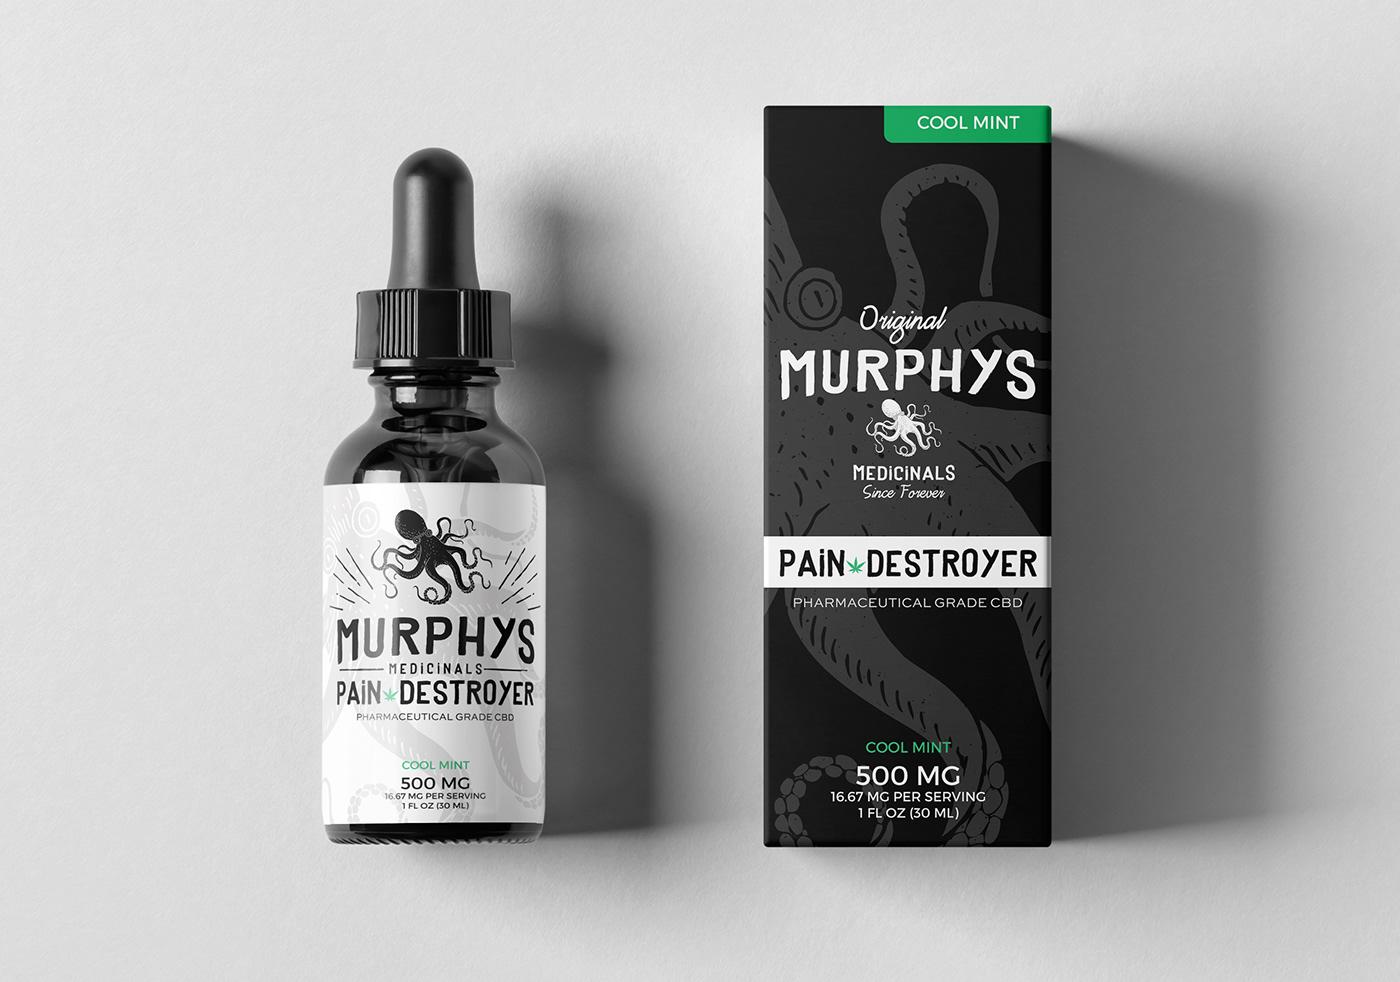 CBC Murphys Medicinals